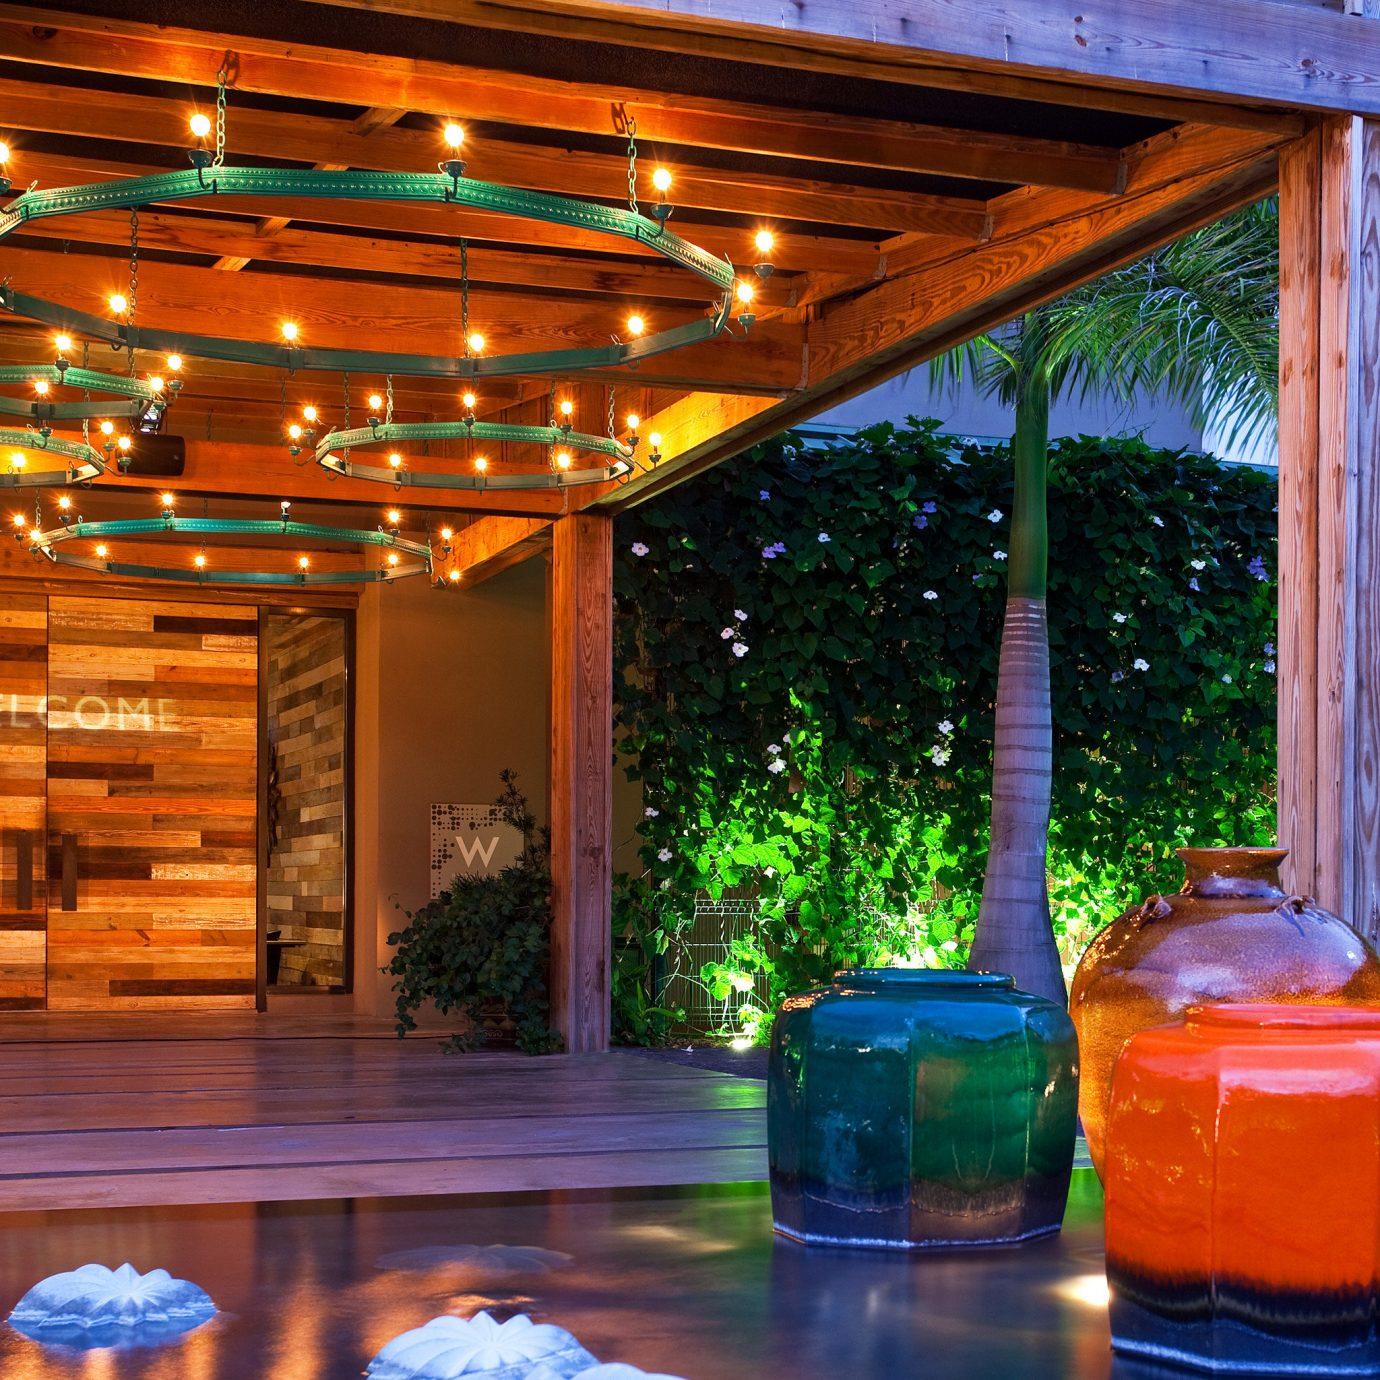 Hotels Lounge Modern Resort tree lighting